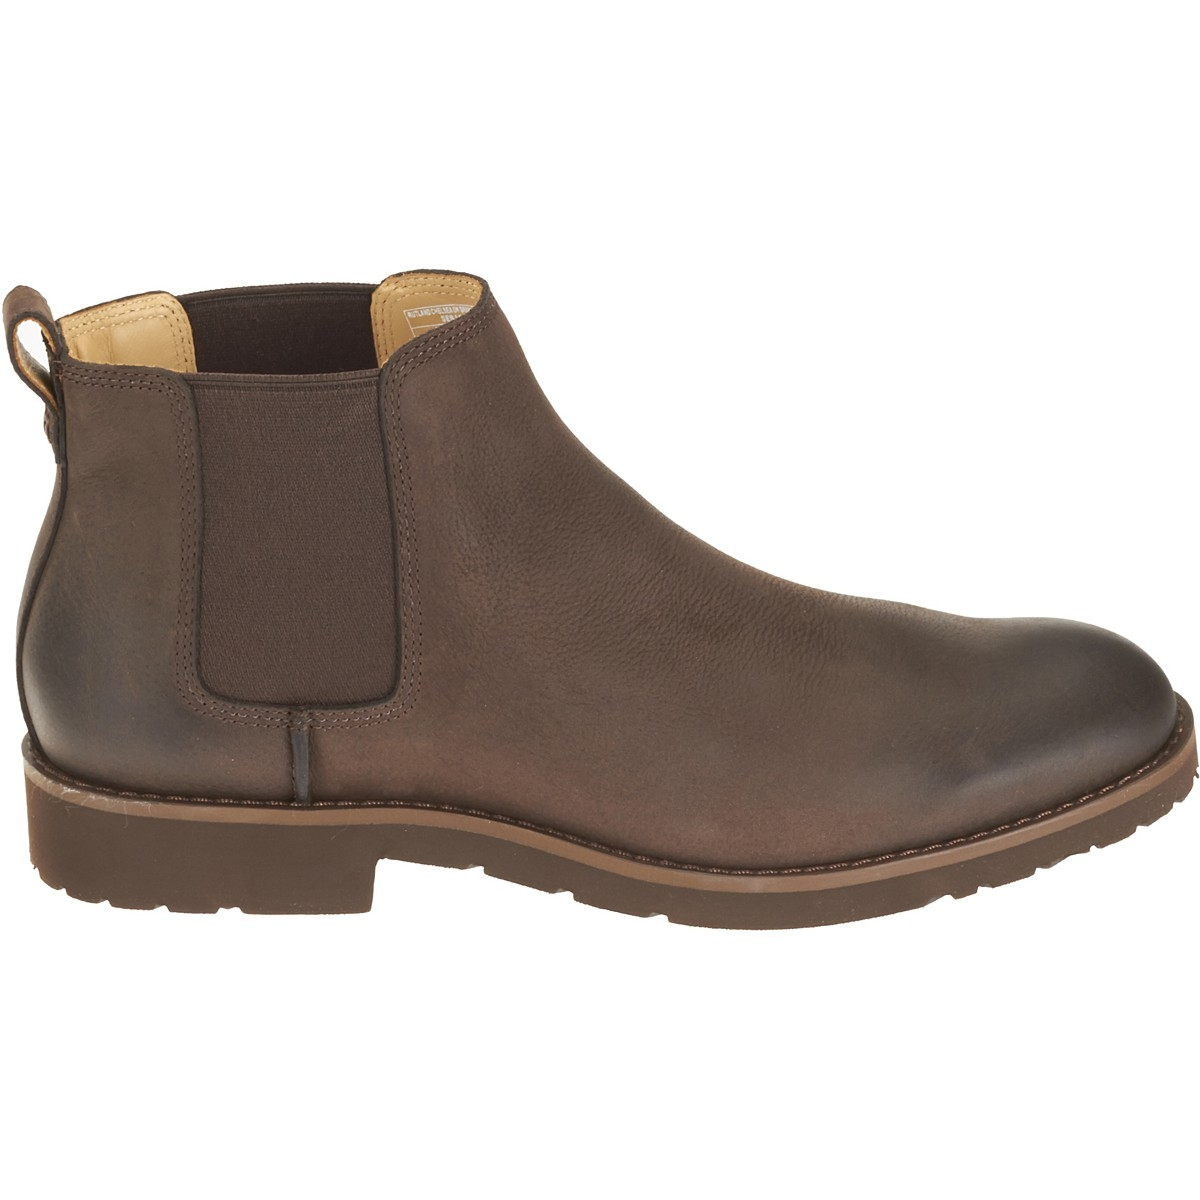 sebago rutland chelsea boots s brown nubuck